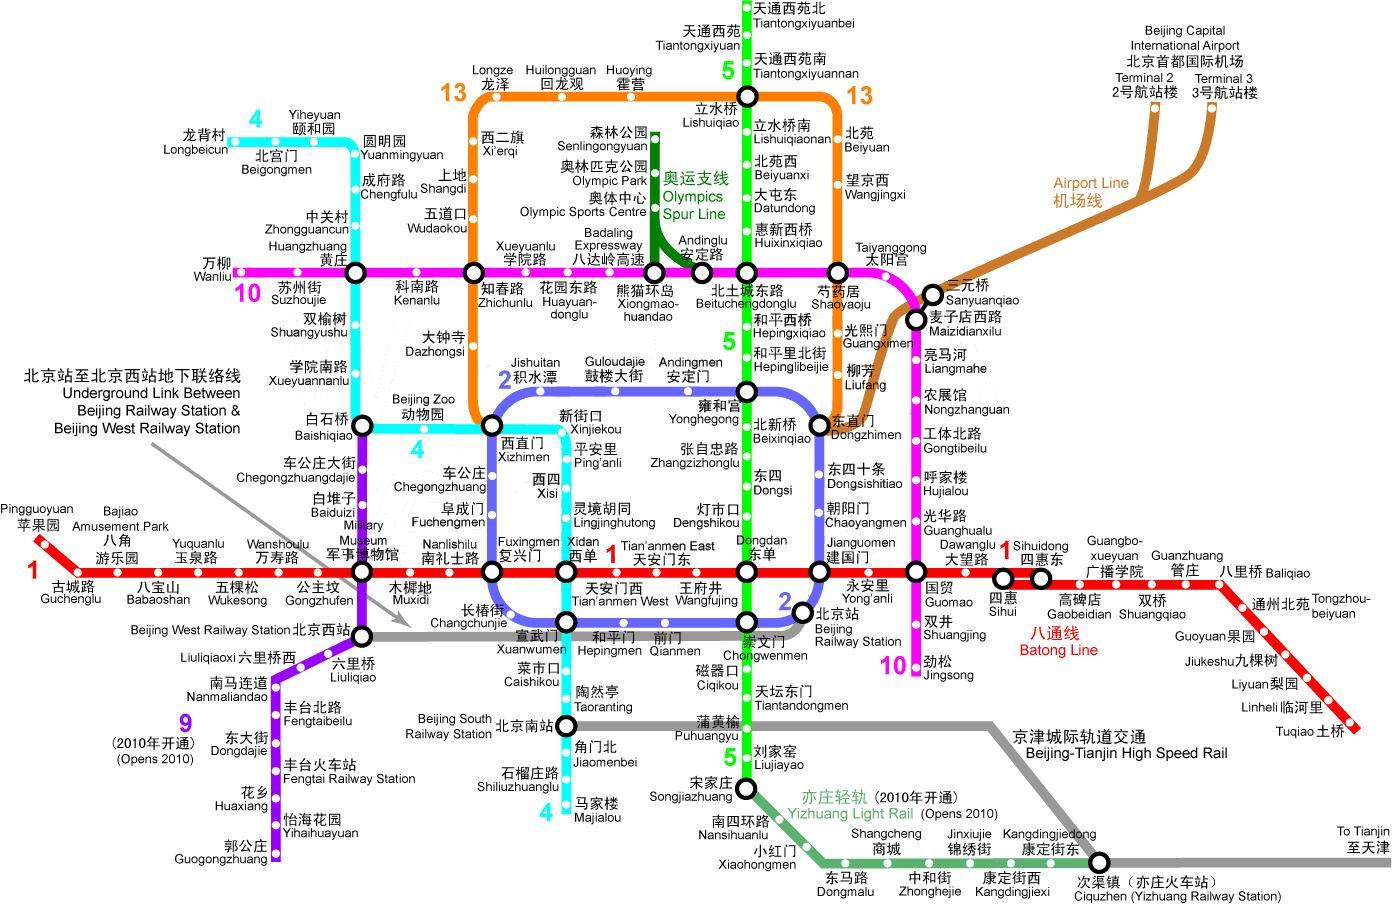 Beijing Subway Map Beijing Subway Lines Beijing Subway Stations – Beijing Tourist Attractions Map